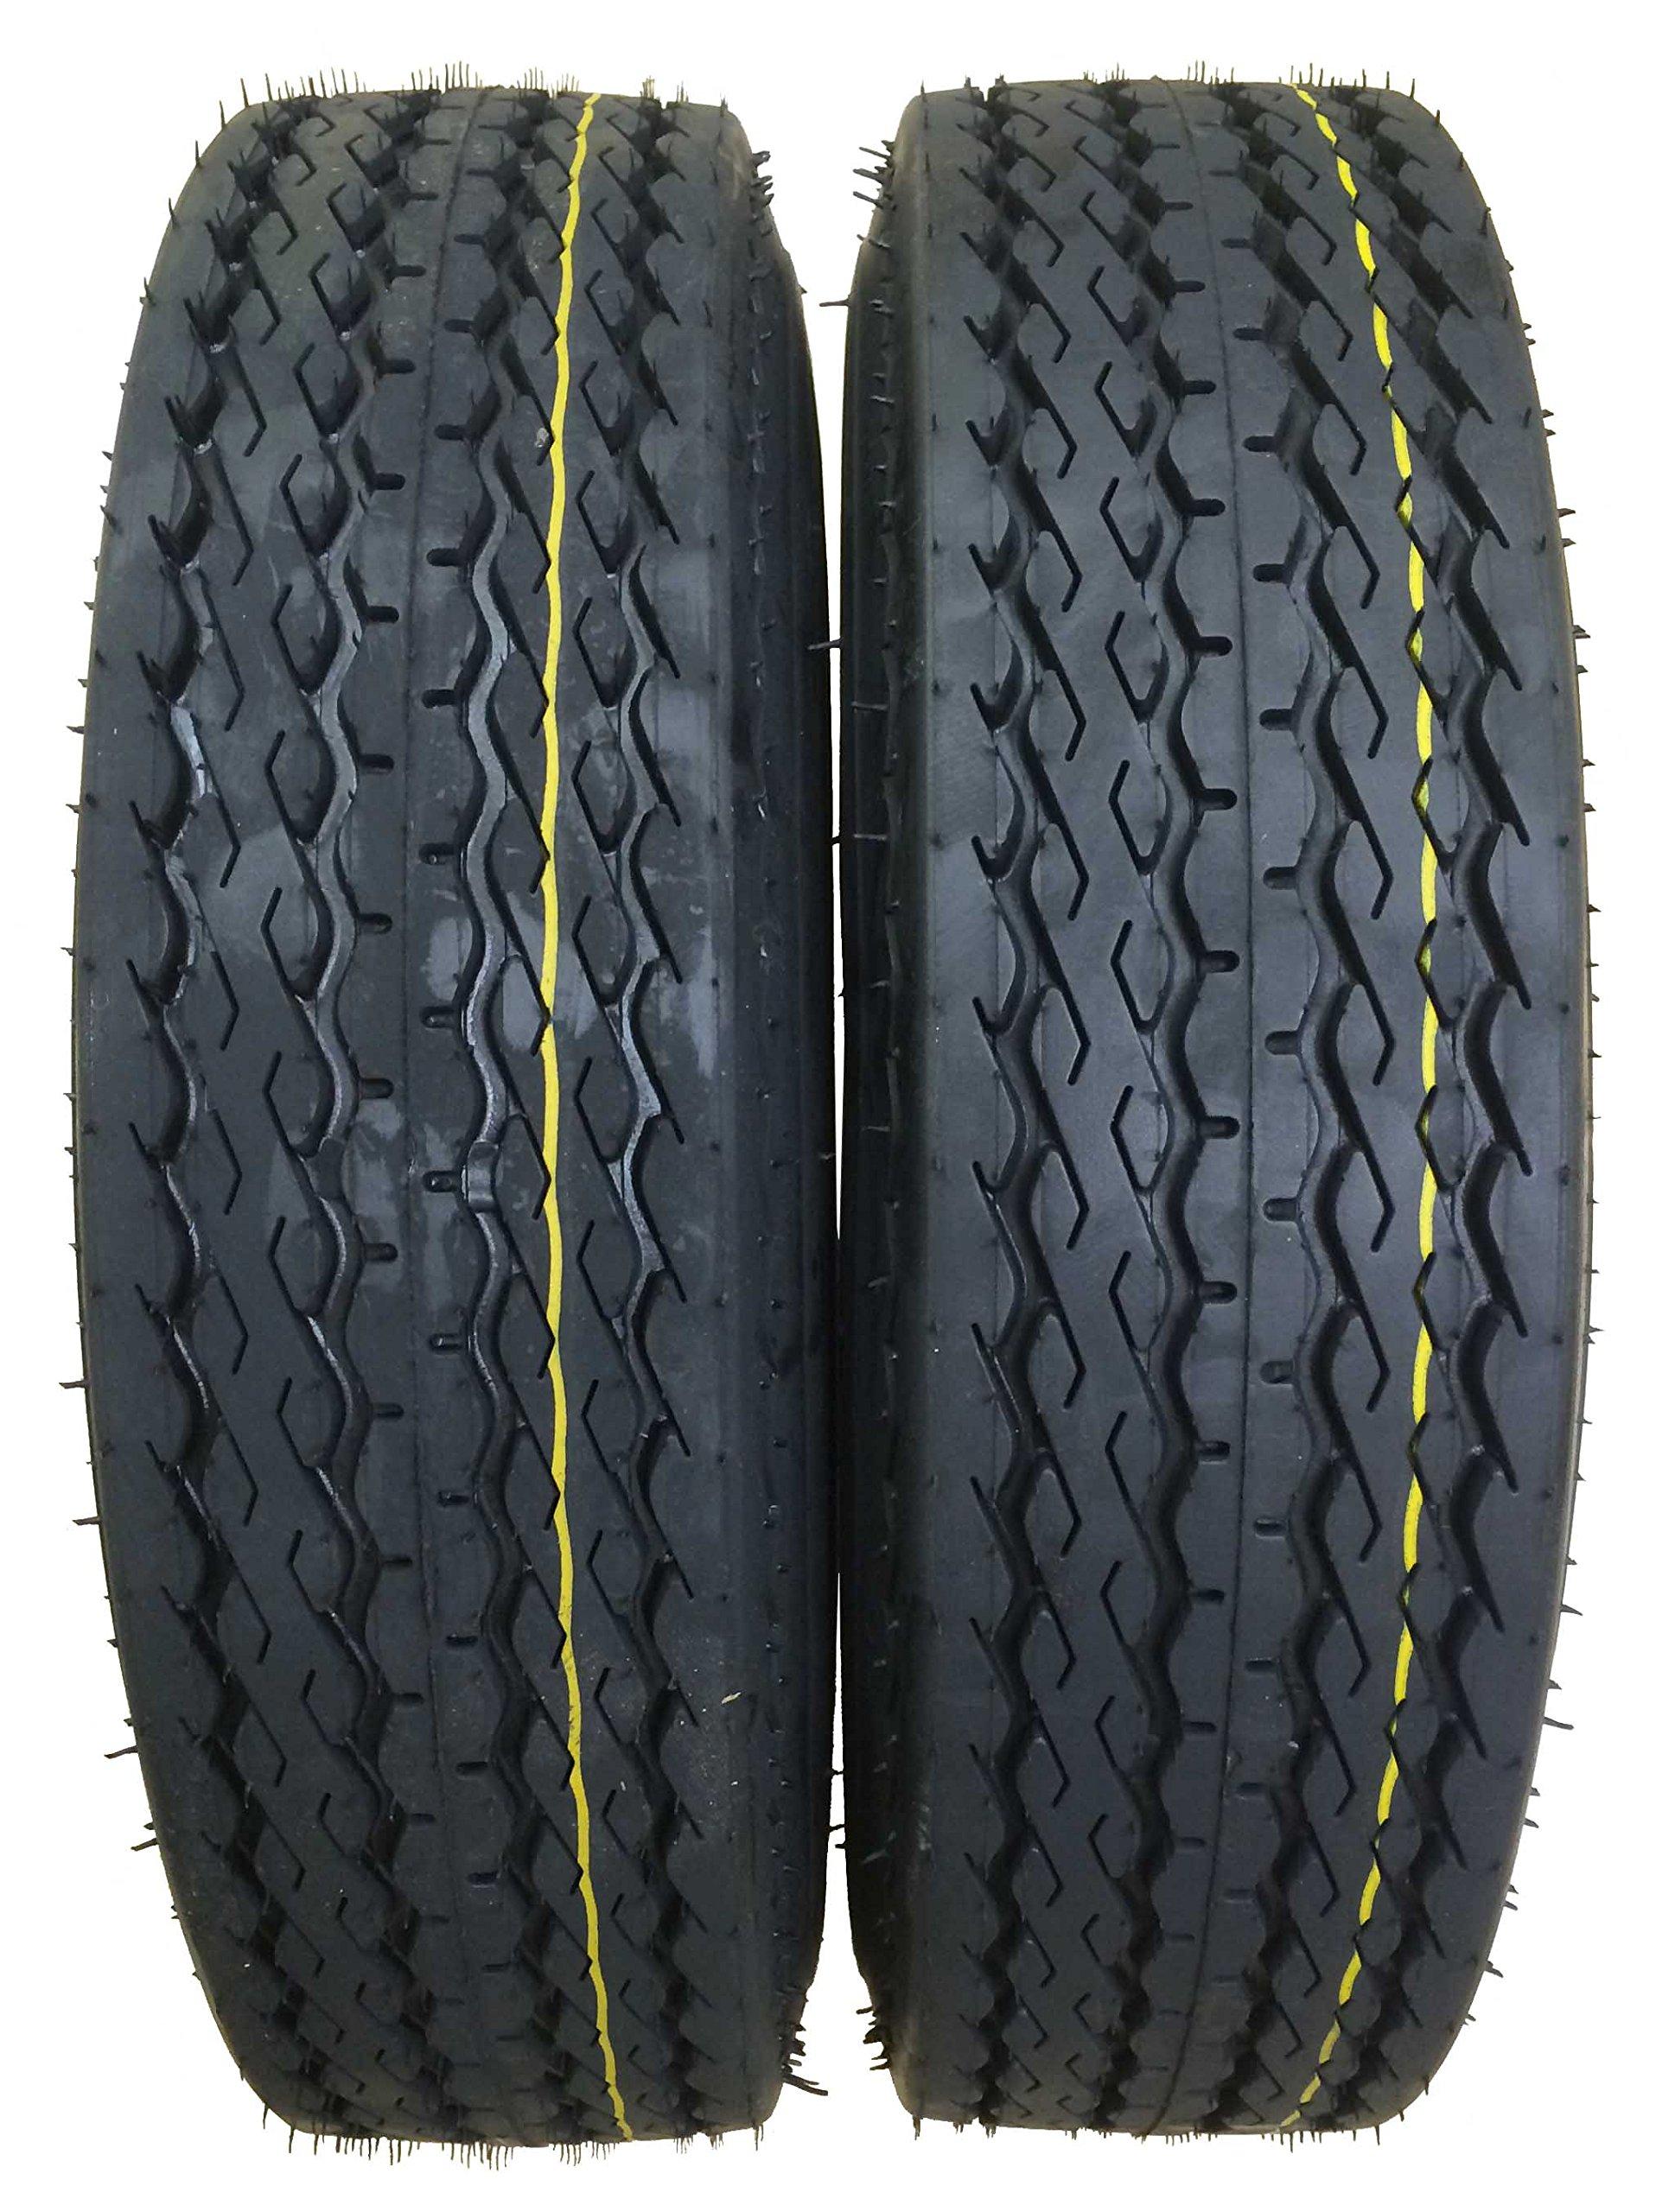 2 New Highway Boat Motorcycle Trailer Tires 5.70-8 6PR Load Range C - 11036